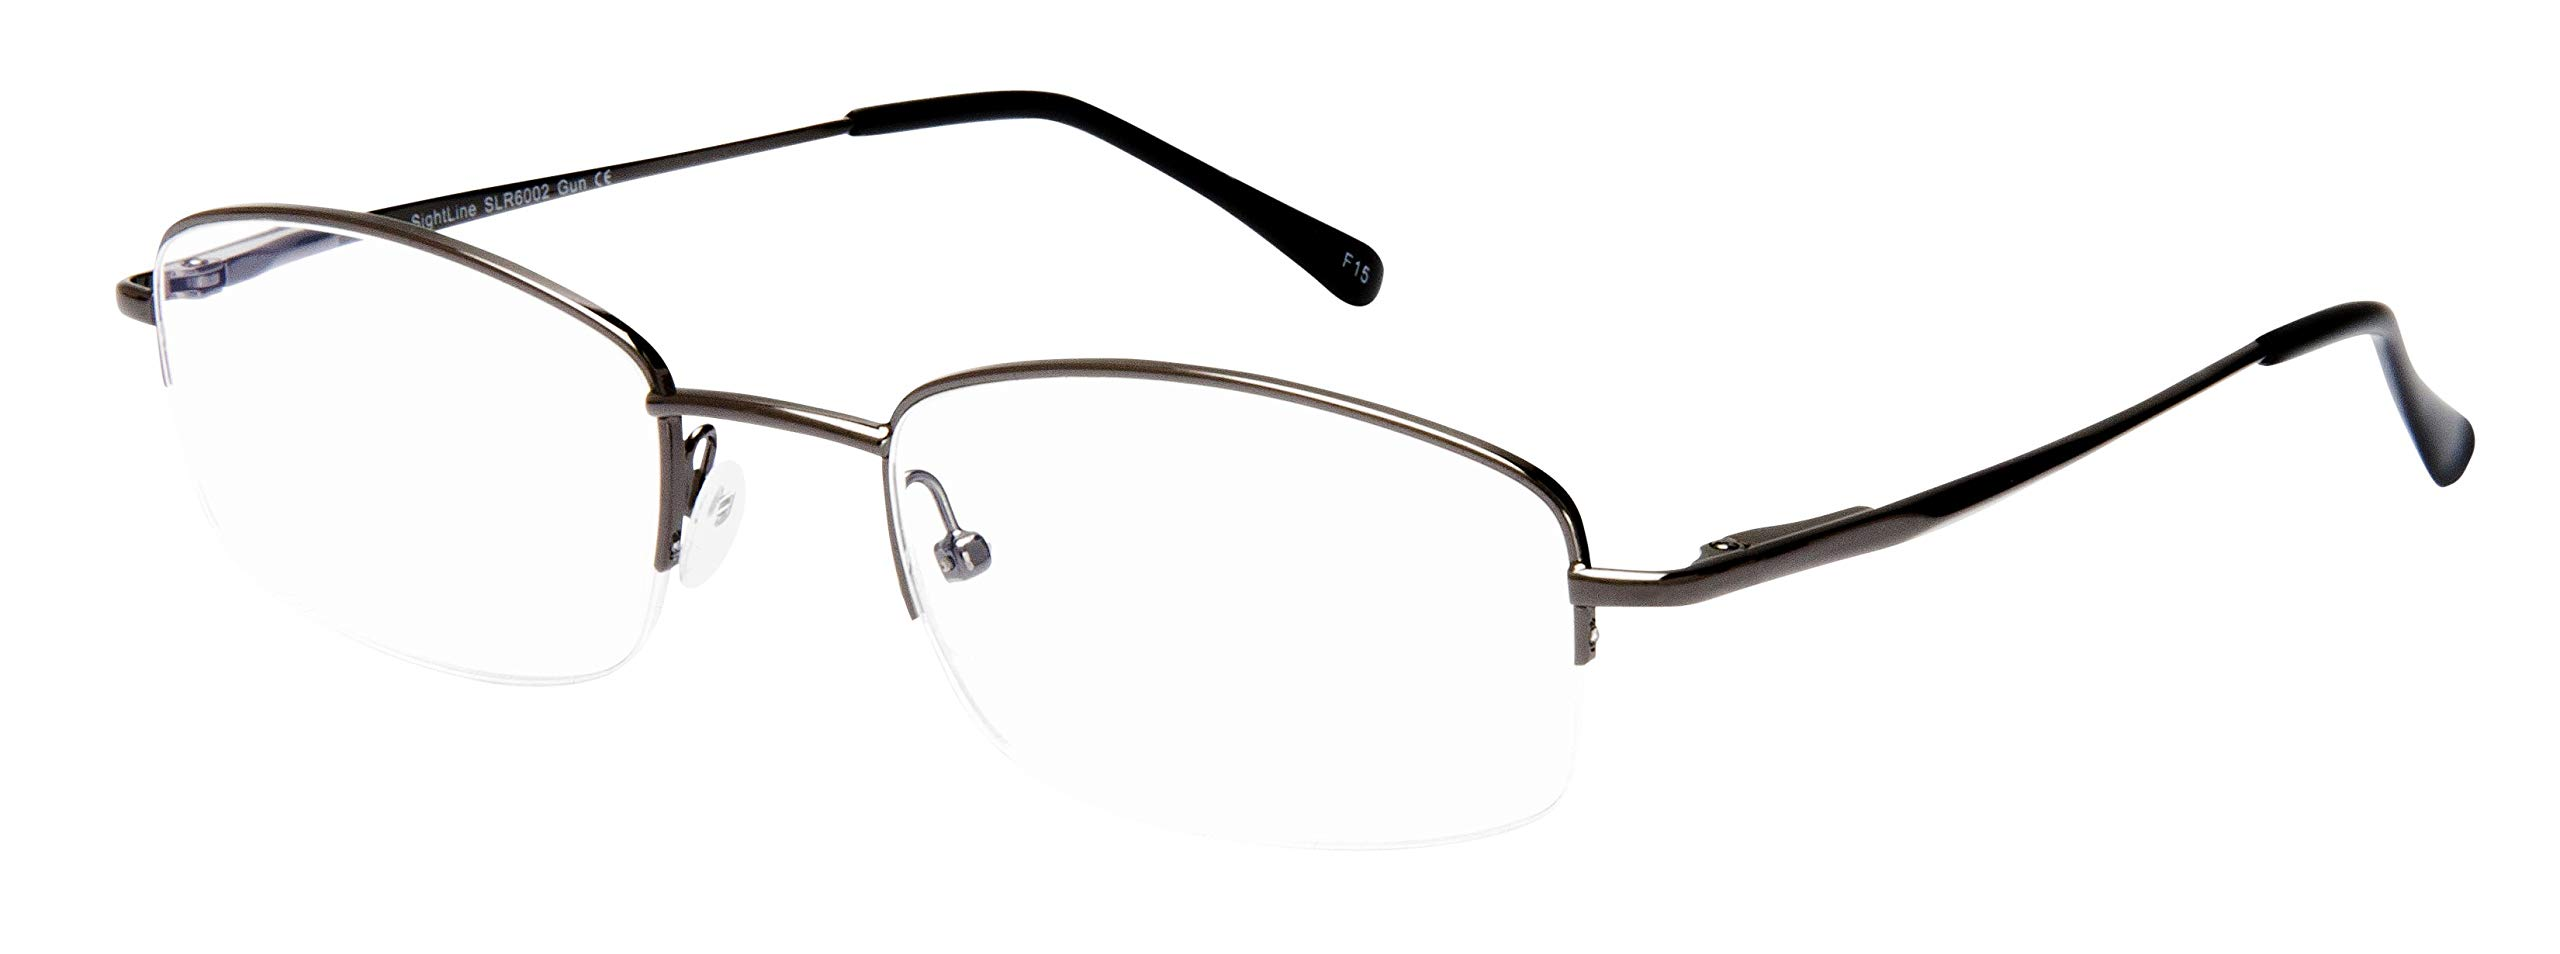 Sightline 6002 Progressive Multi Focus Reading Glasses Lightweight Semi-Rimless